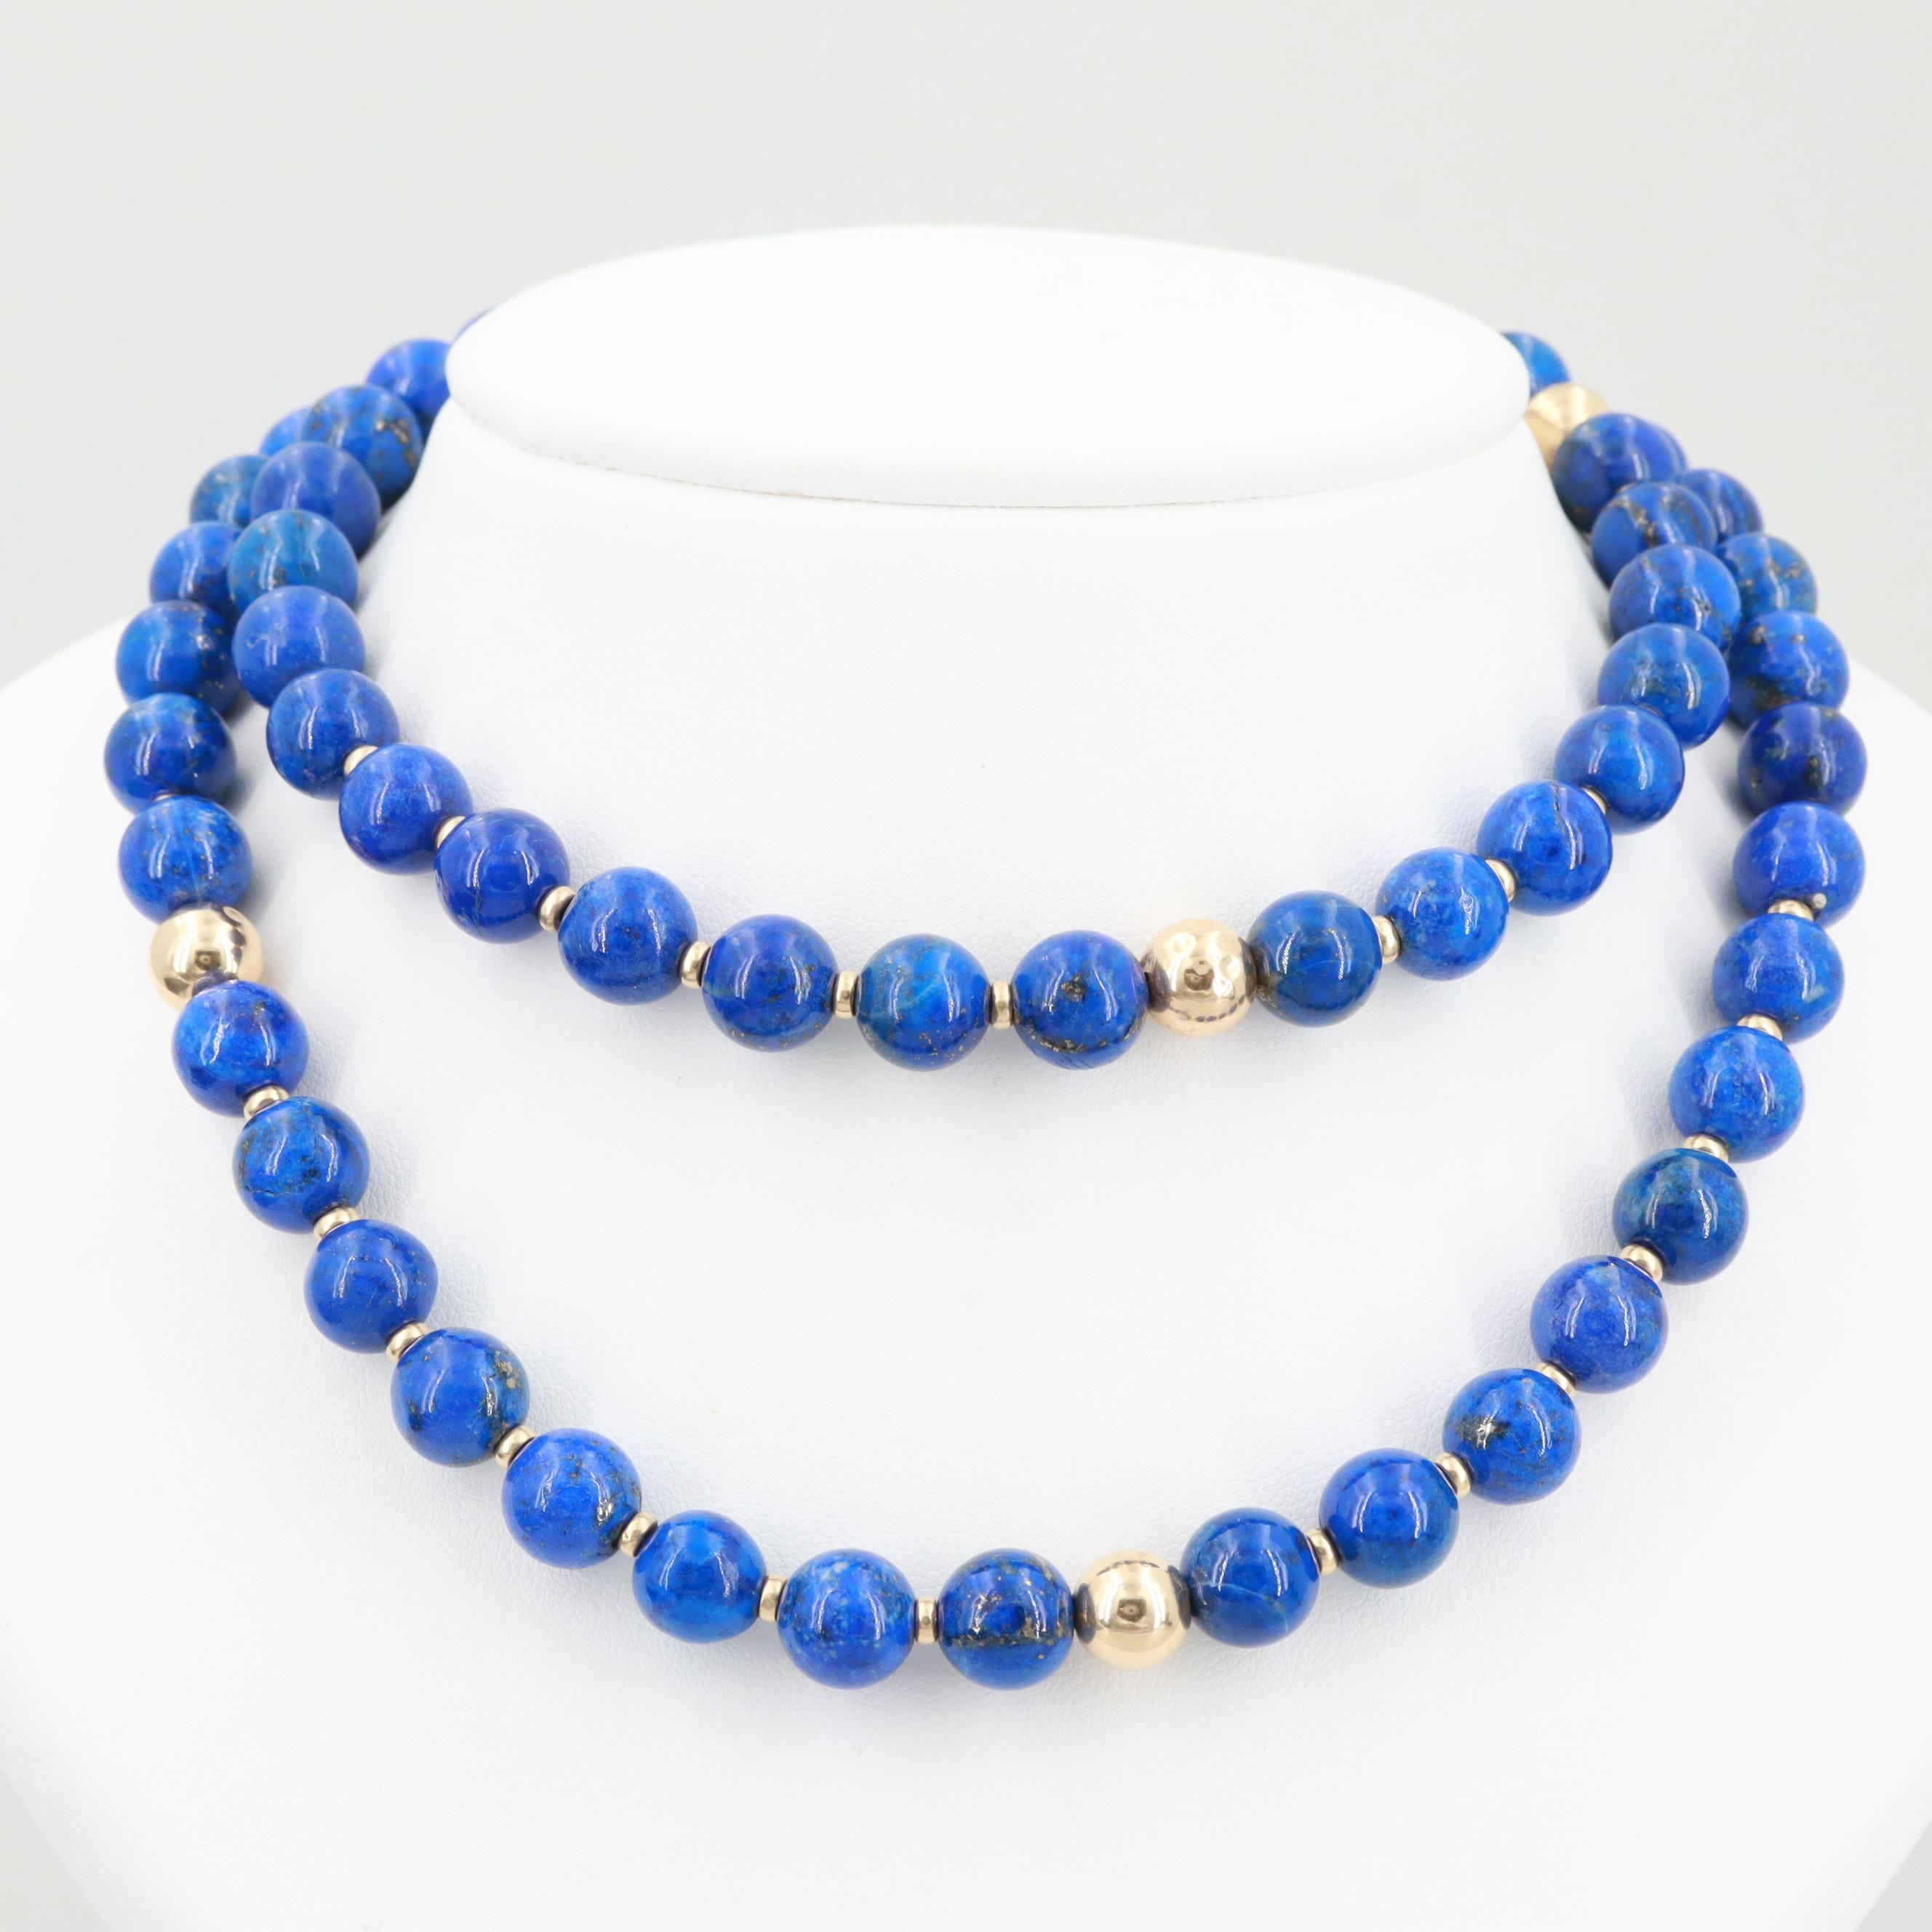 14K Yellow Gold Lapis Lazuli Beaded Necklace